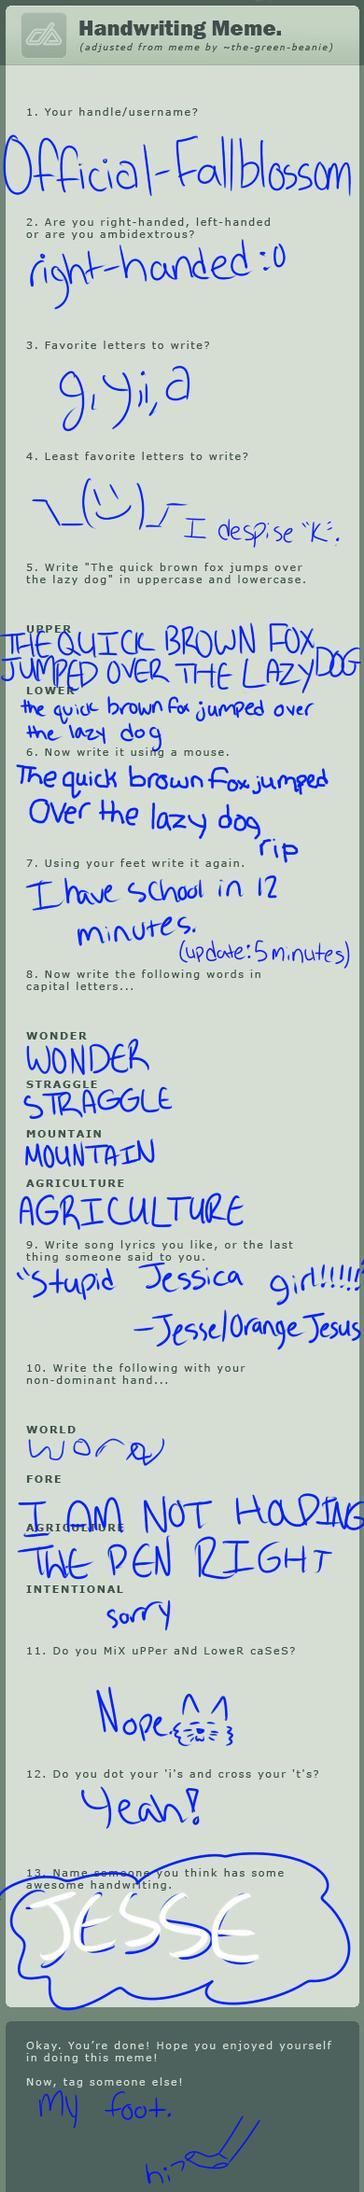 Handwriting Meme by Official-Fallblossom